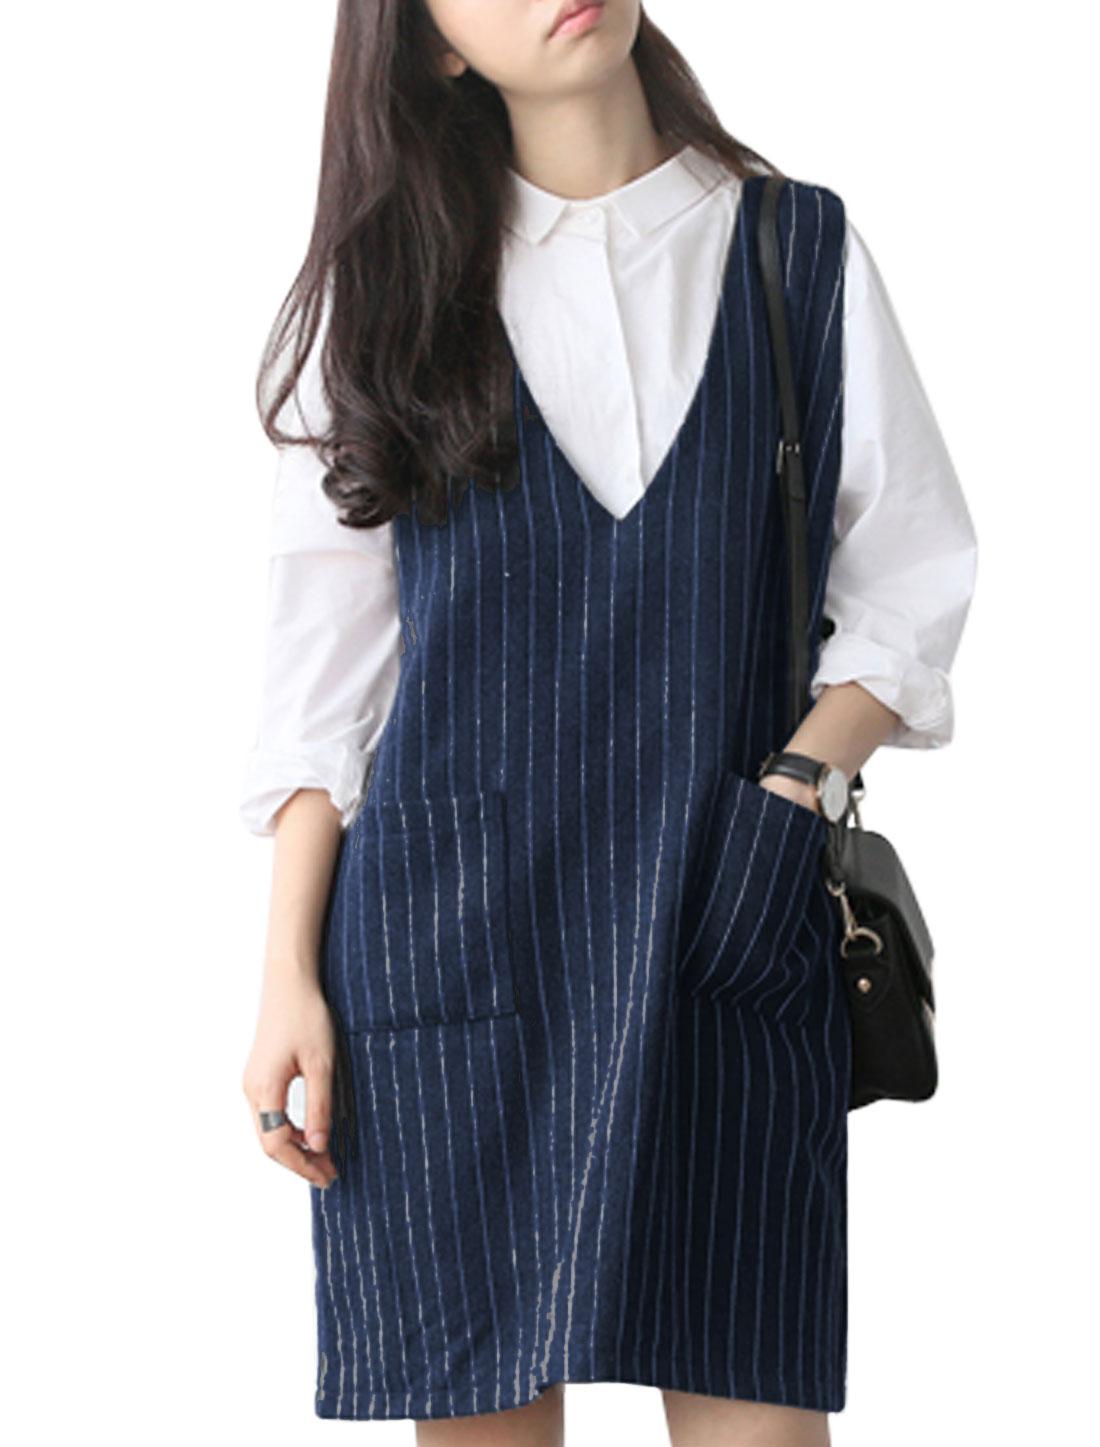 Ladies Navy Blue Stripes Deep V Neck Zipper Back Straight Dress XS